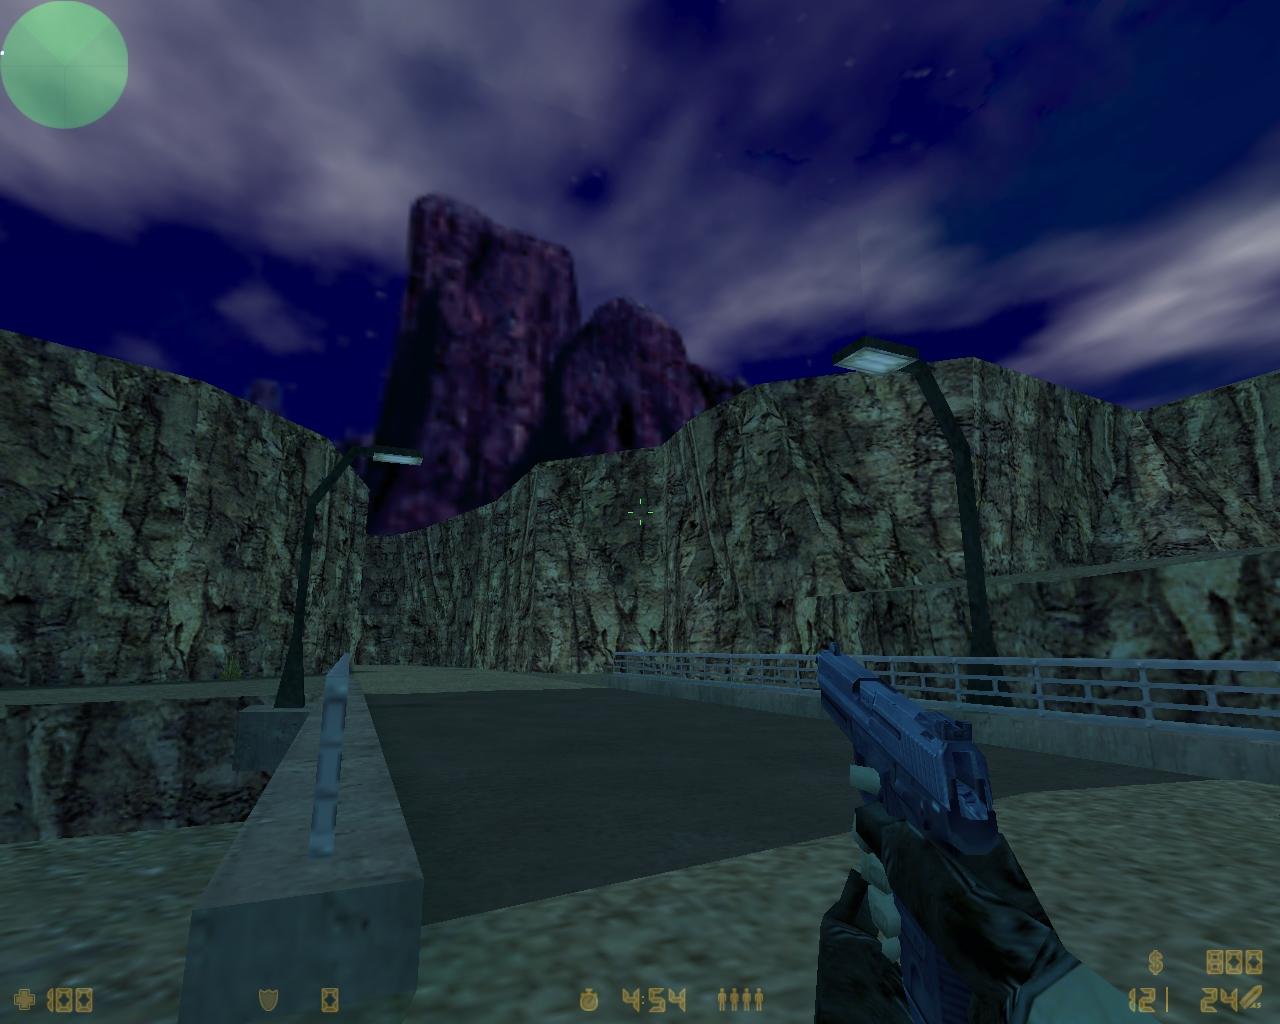 Ночной cs_siege - Counter-Strike